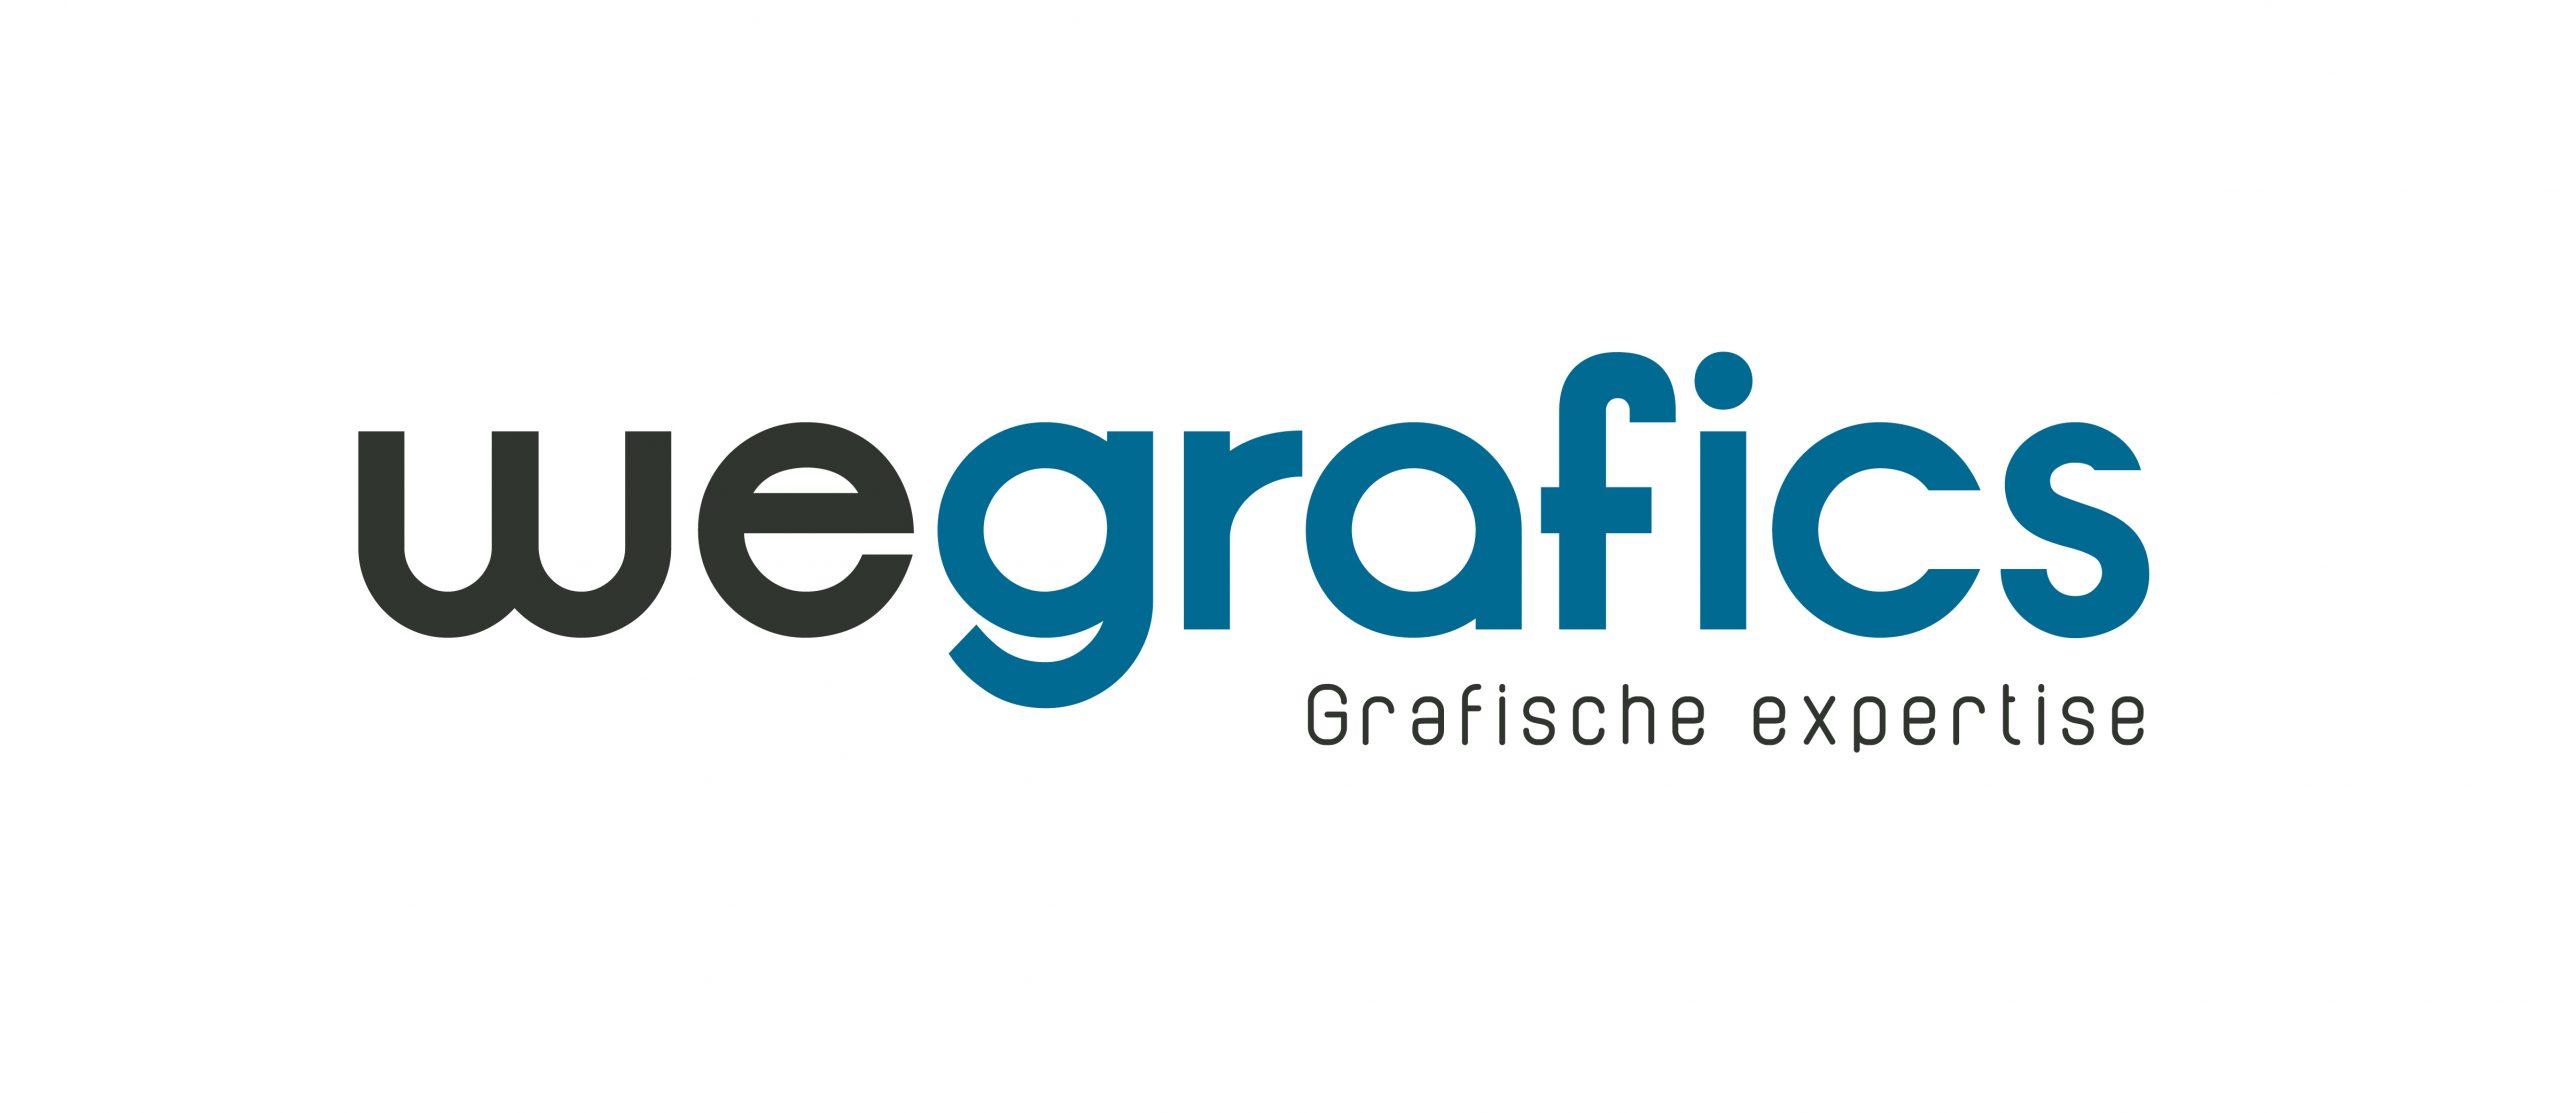 Wegrafics logo